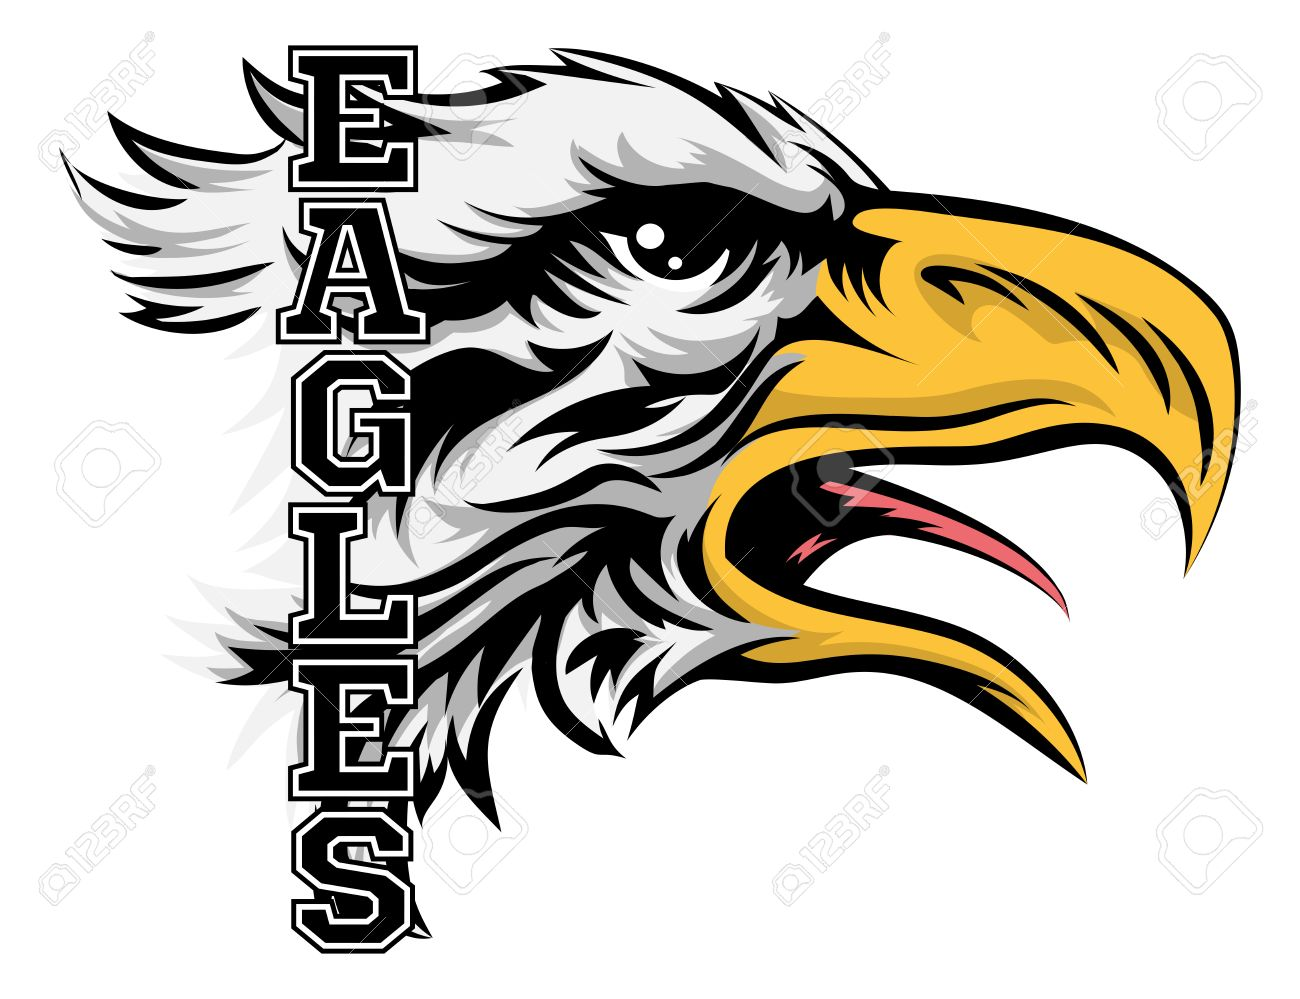 1300x999 Images Of Eagle Mascots